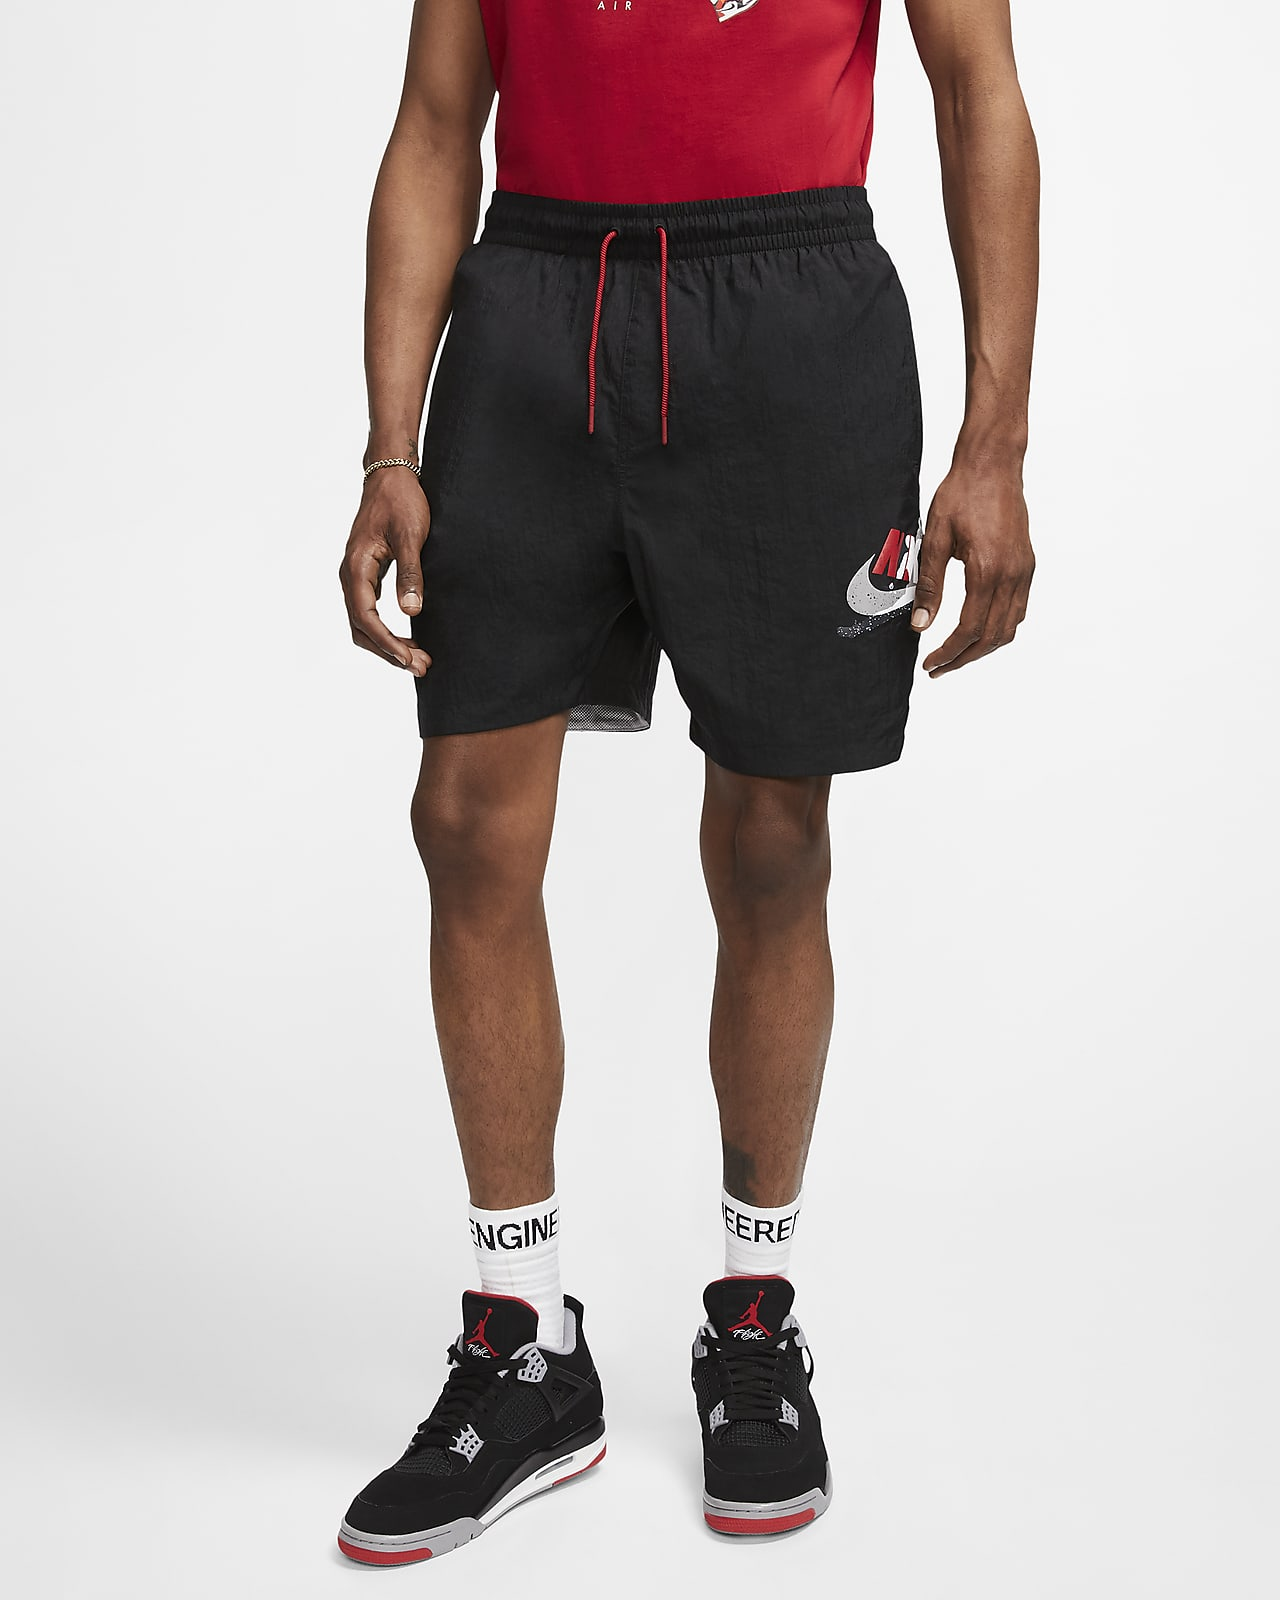 Jordan Jumpman Poolside Pantalons curts de 18 cm - Home